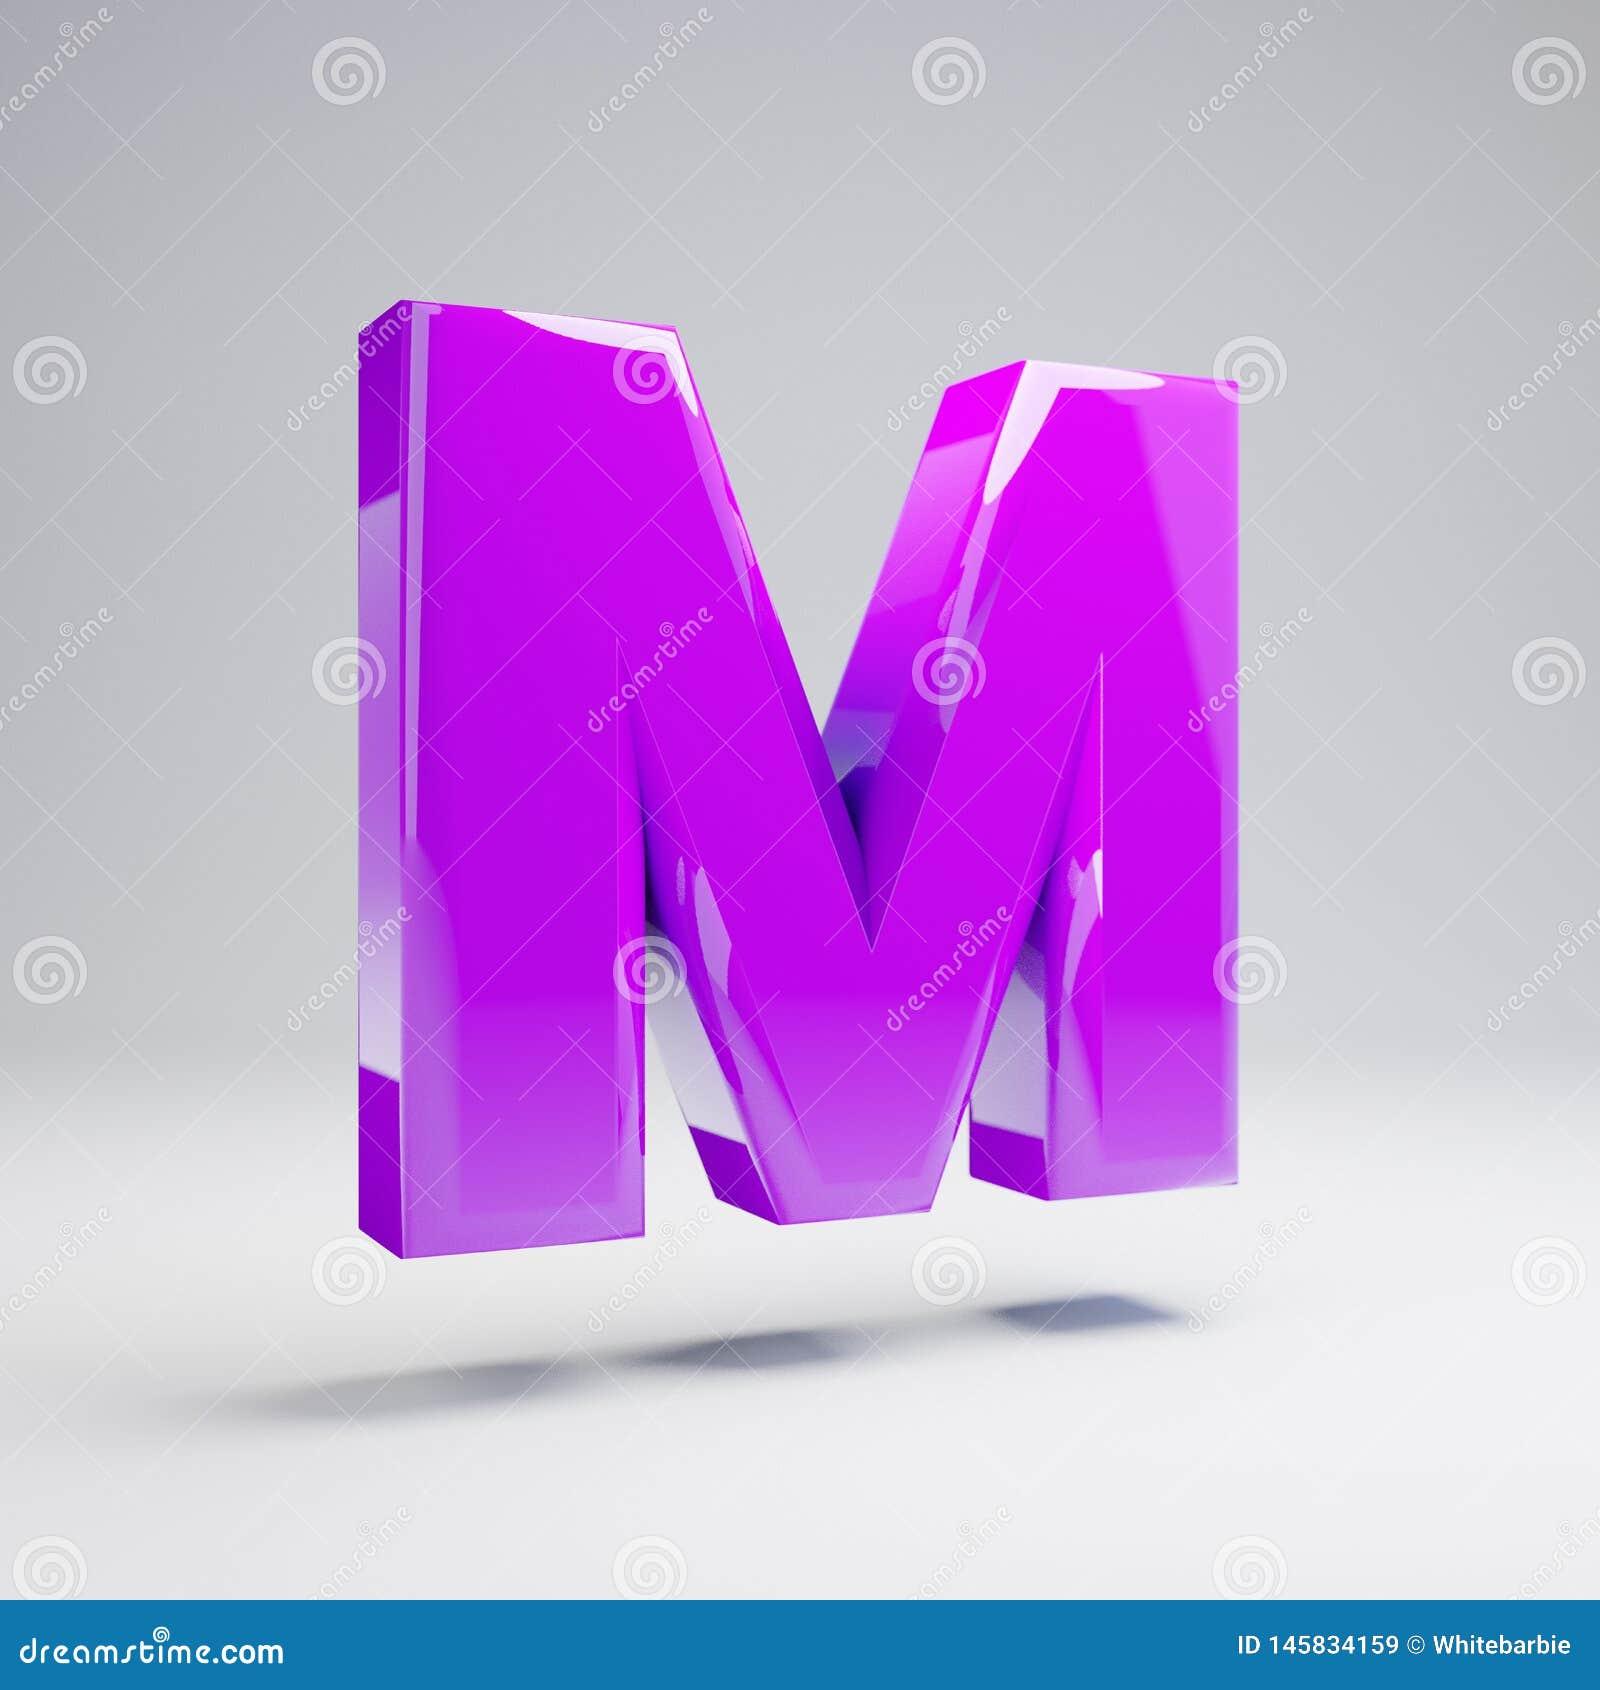 Volumetric glossy violet uppercase letter M isolated on white background